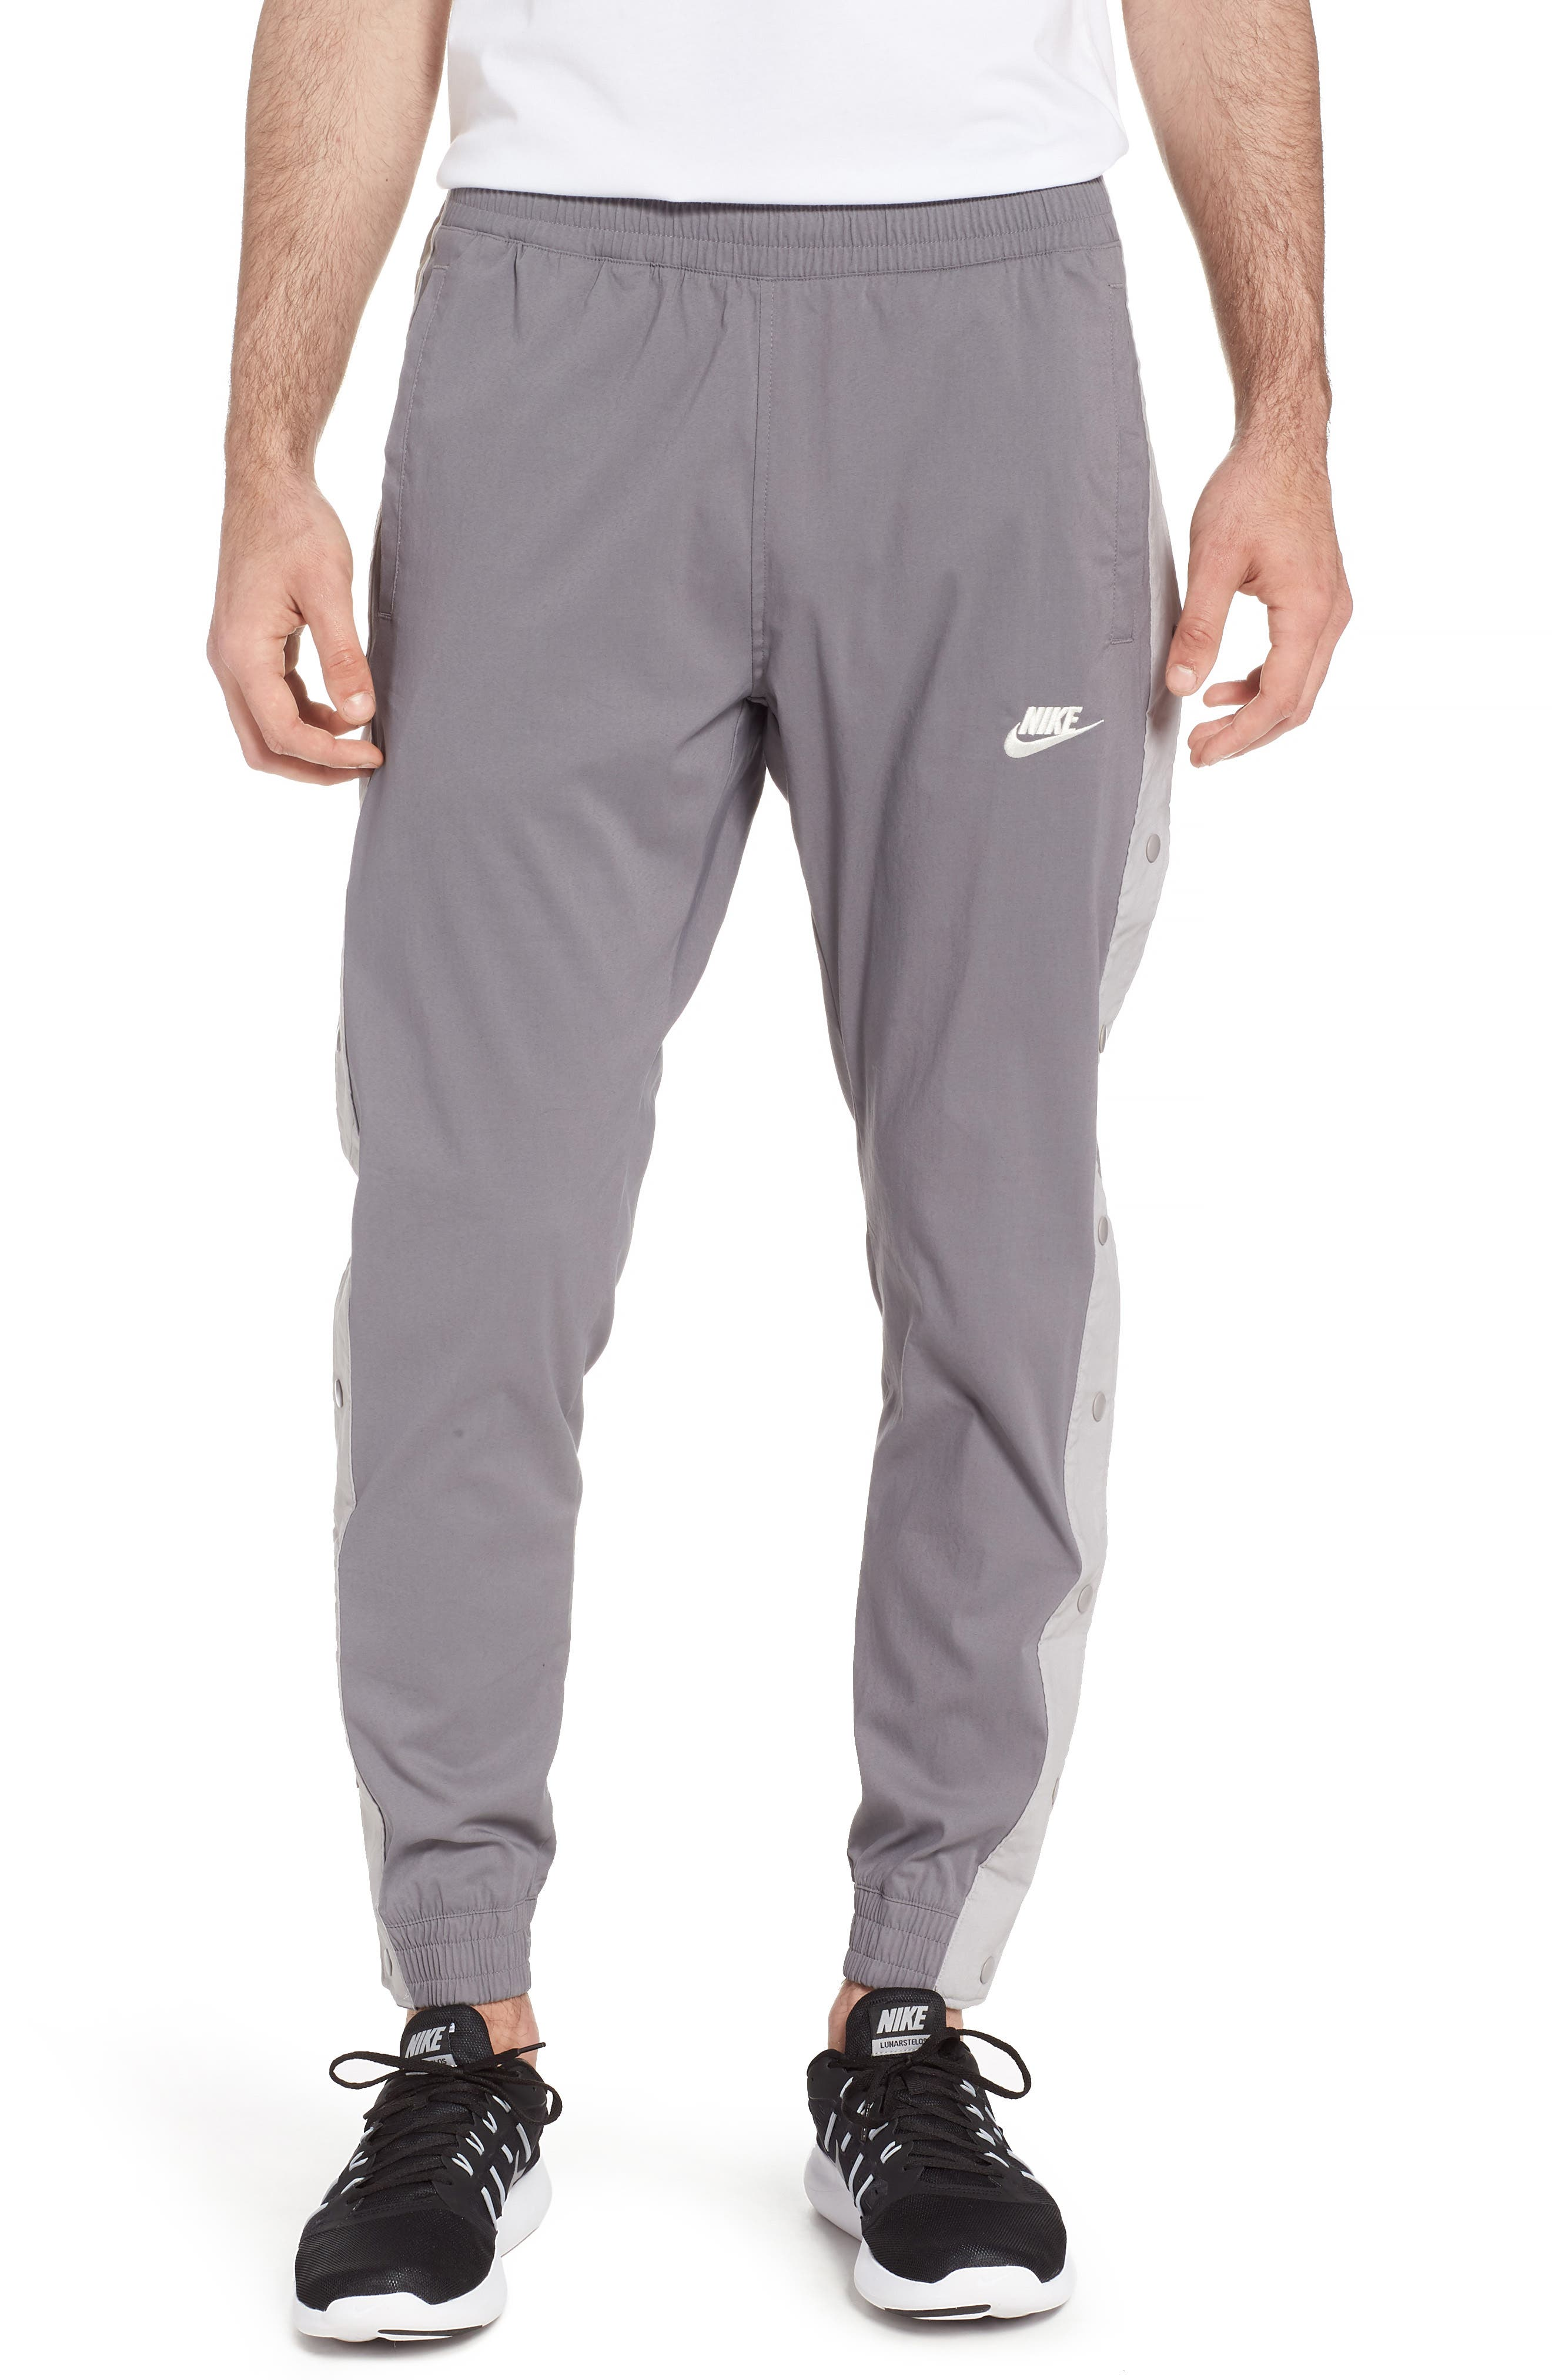 NSW Air Force 1 Lounge Pants,                         Main,                         color, GUNSMOKE/ GREY/ OREWOOD